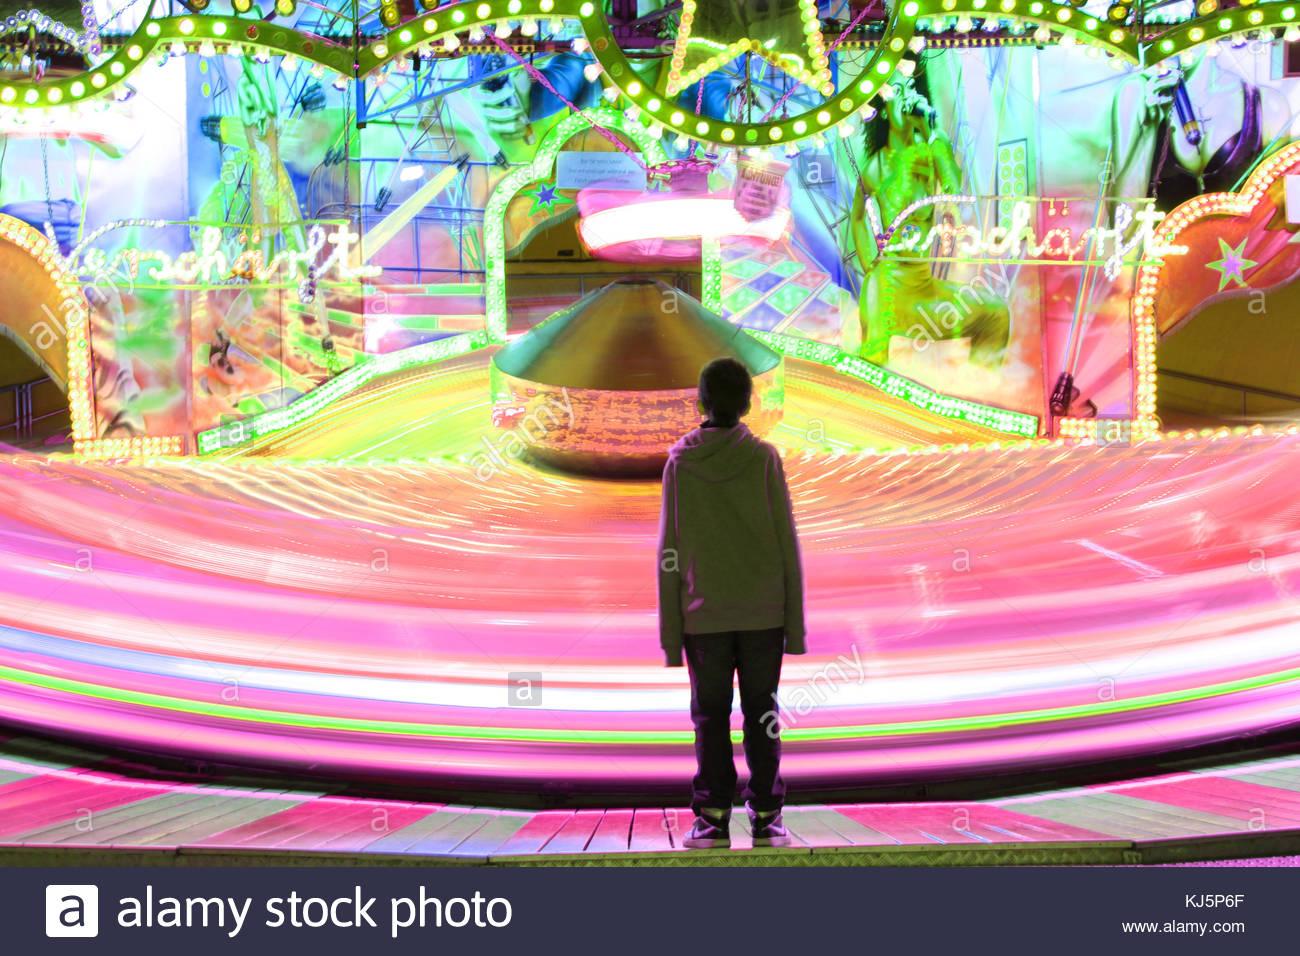 Amusment park ride, long exposure - Stock Image